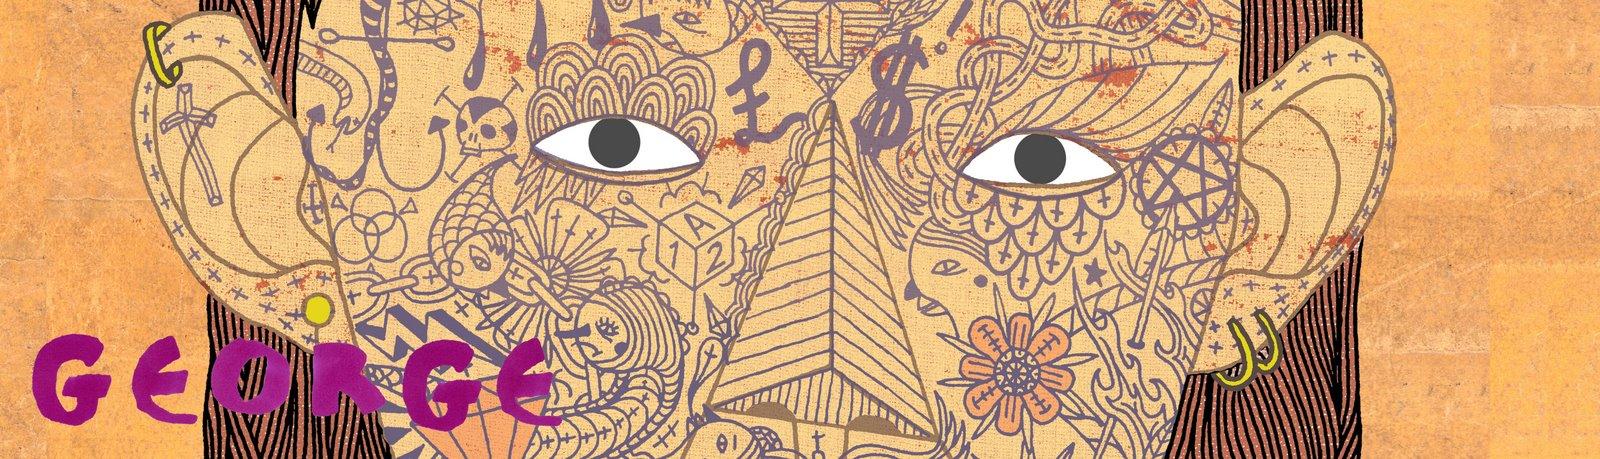 George Mitchell Illustrations